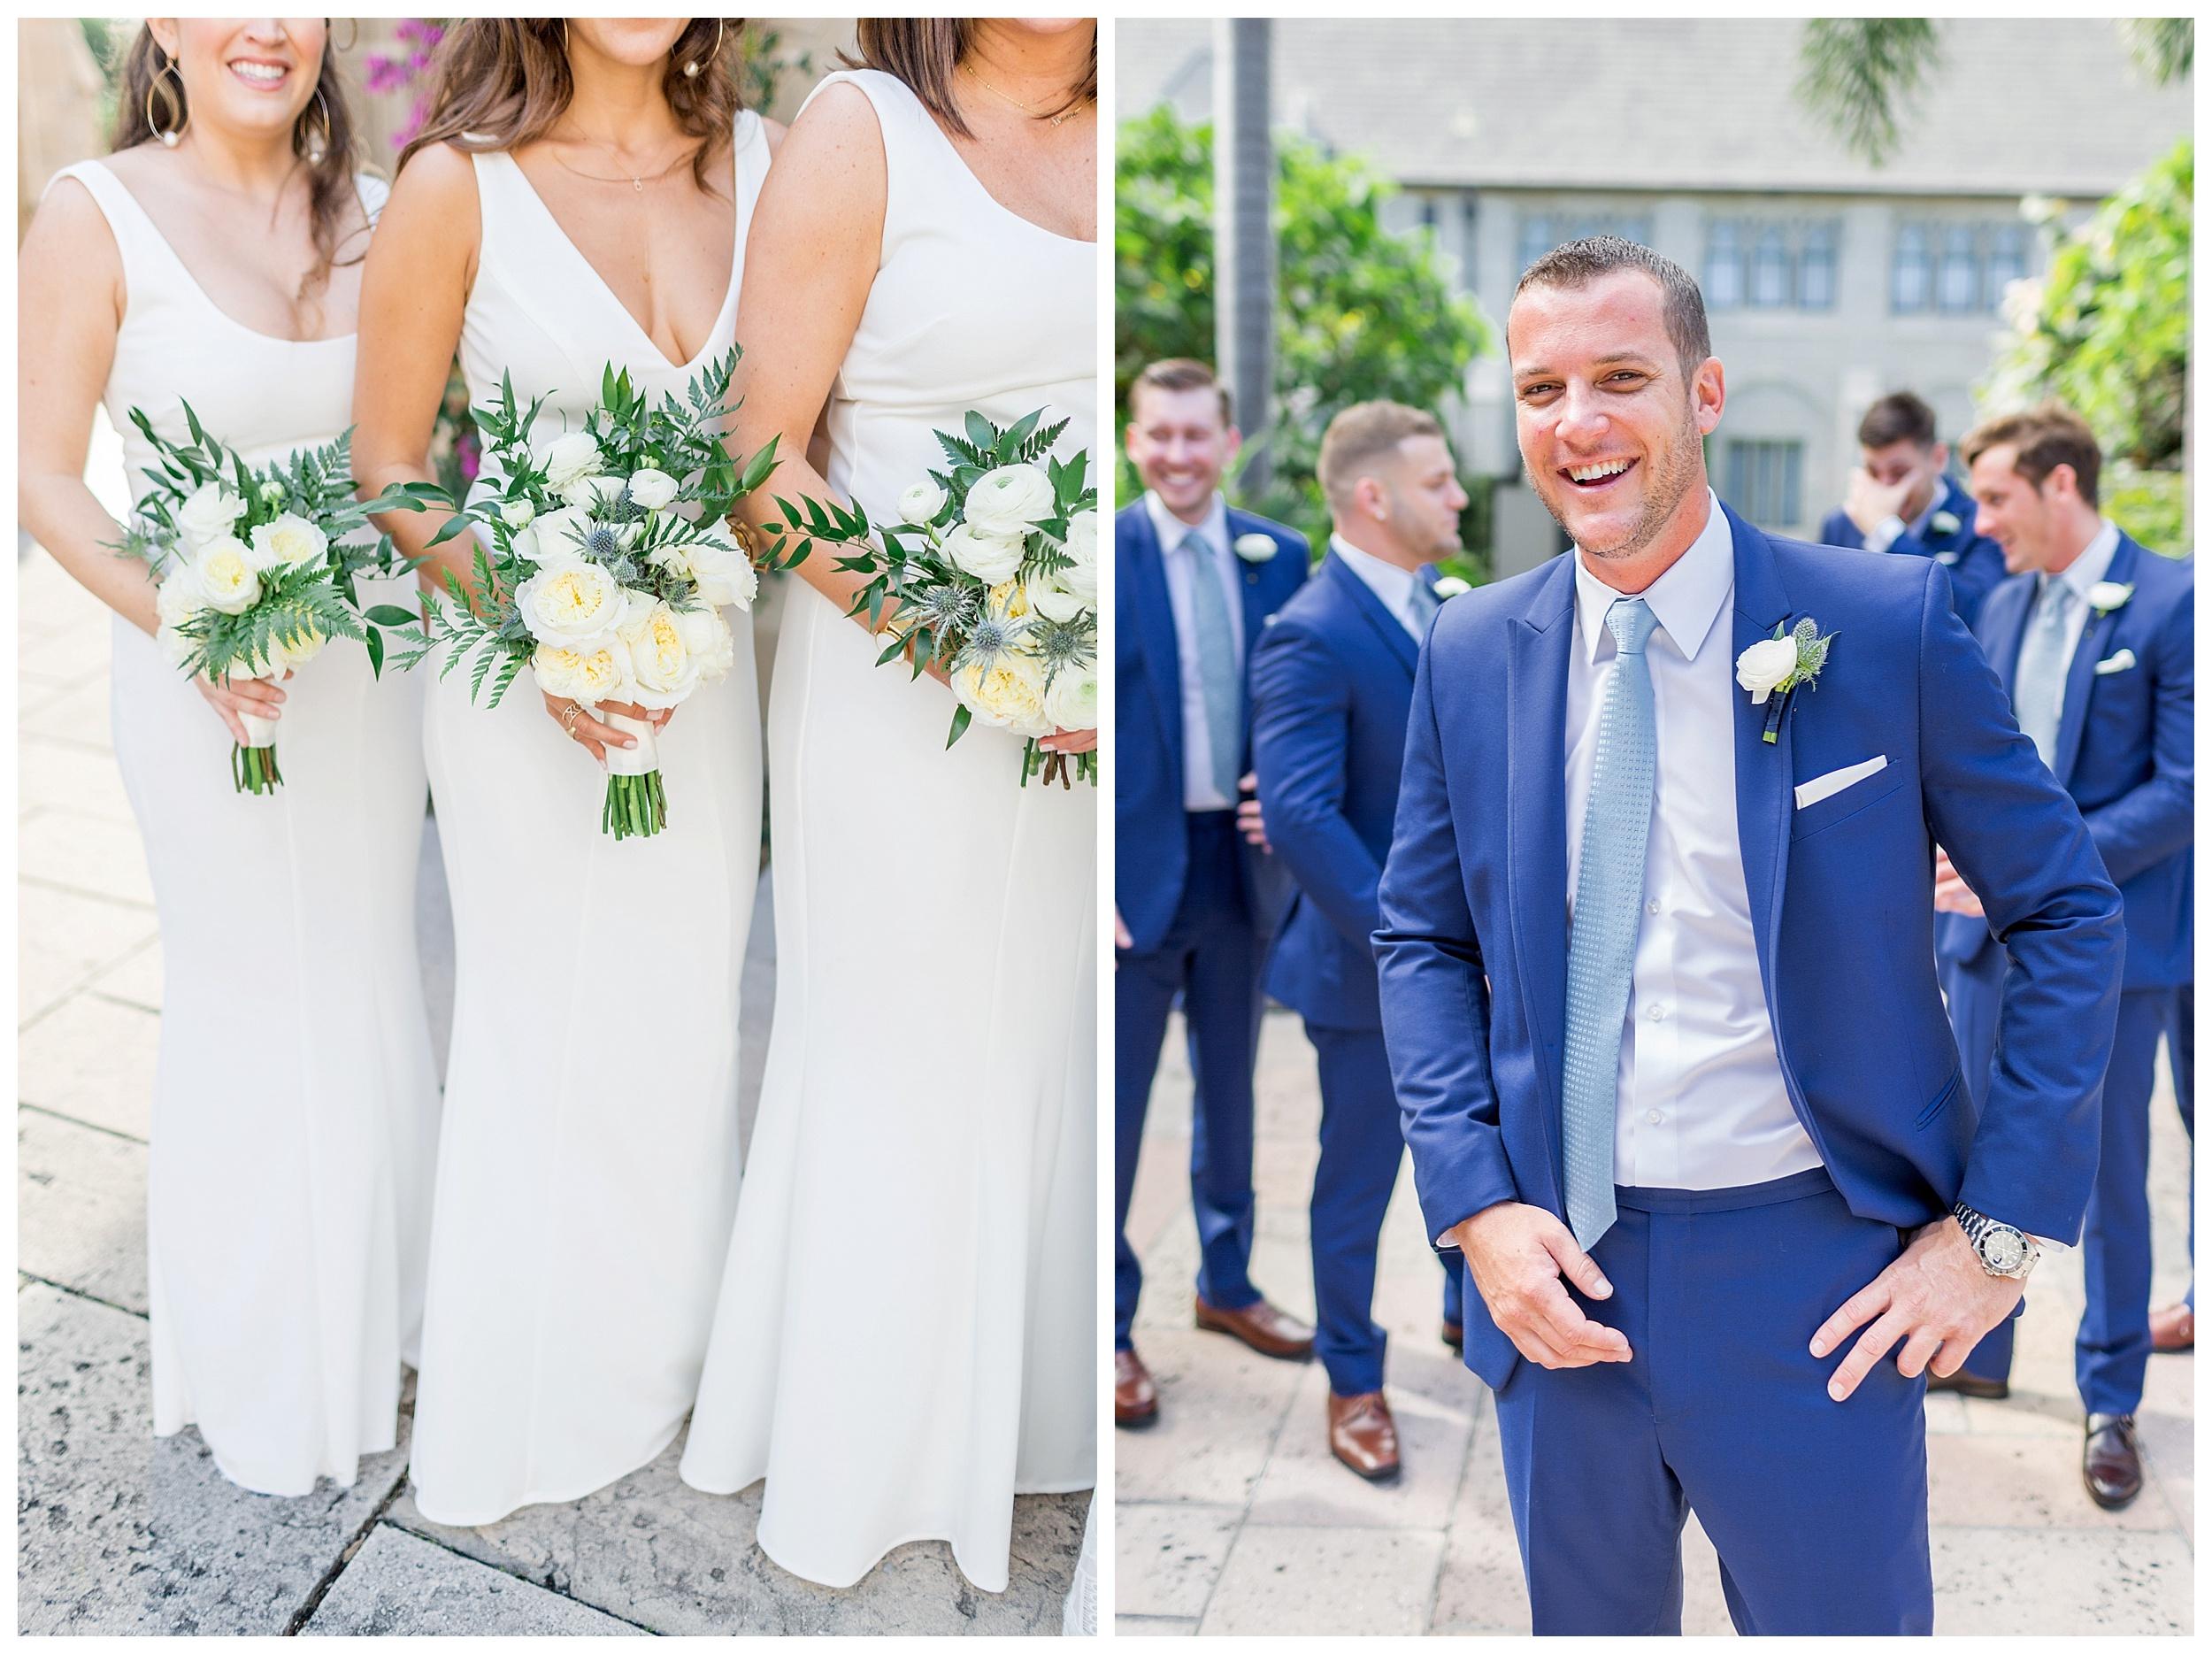 Bethesda By The Sea Palm Beach Wedding_0056.jpg